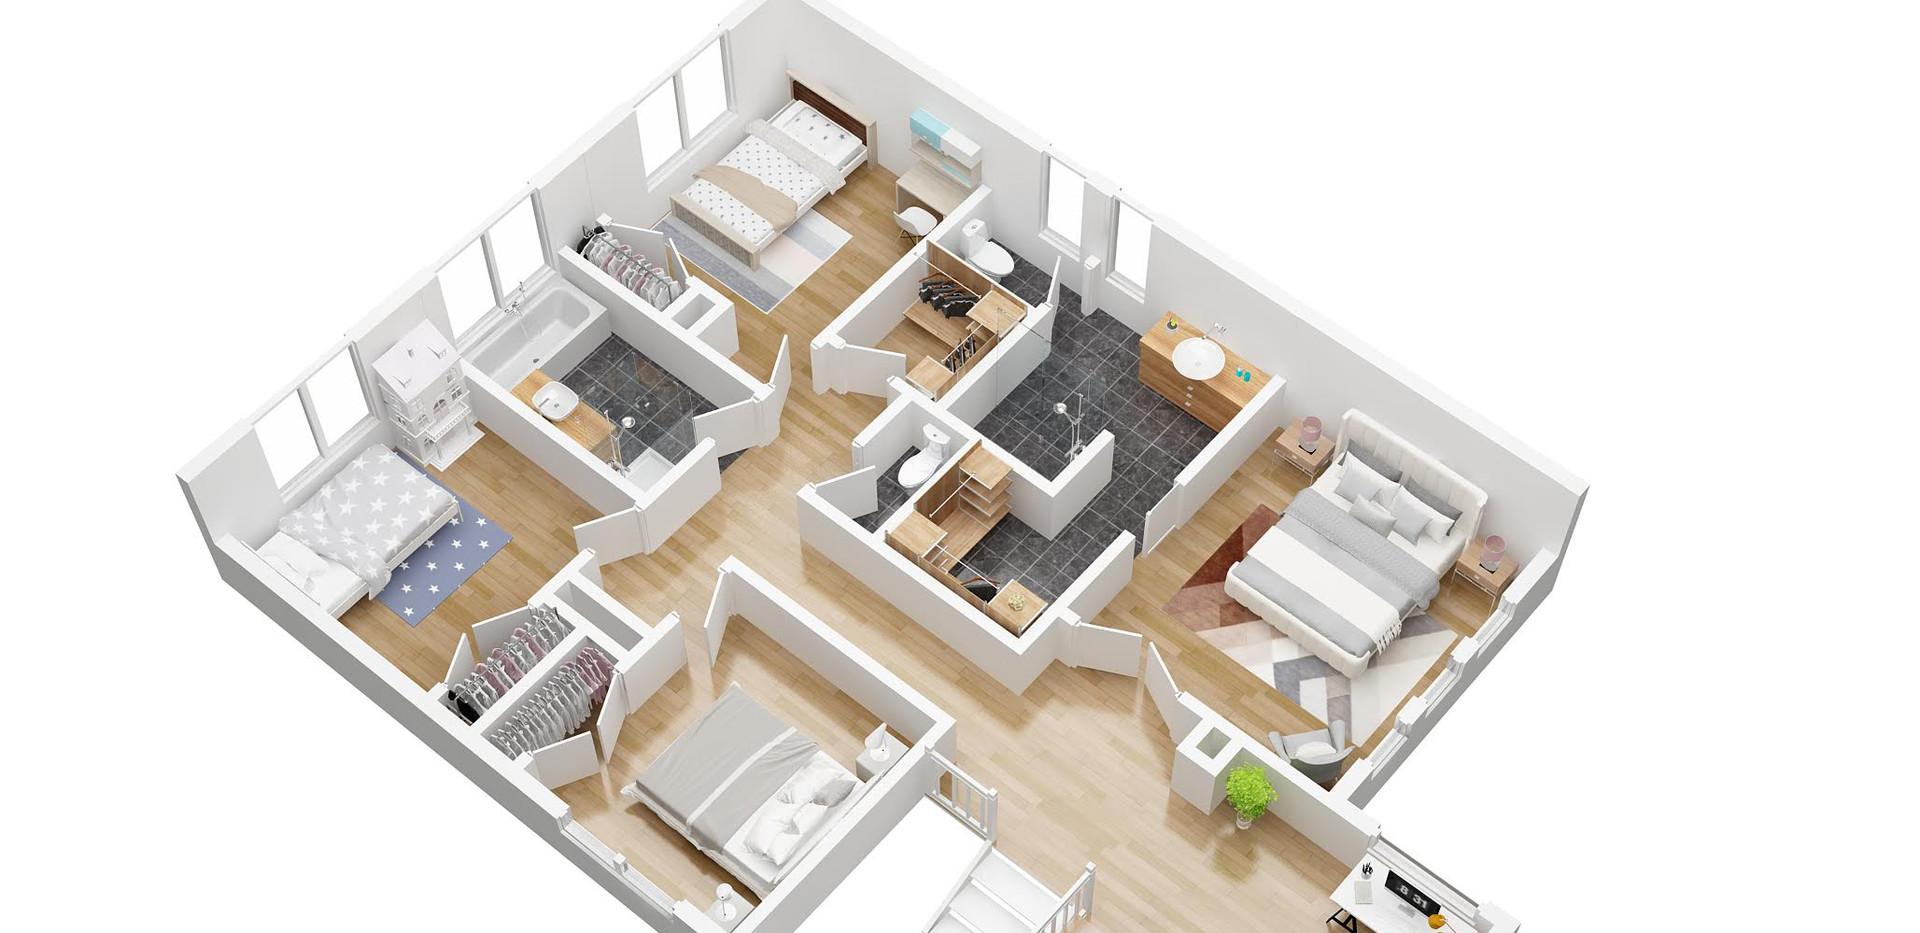 johannafikkers_1st floor_3D  floor plan